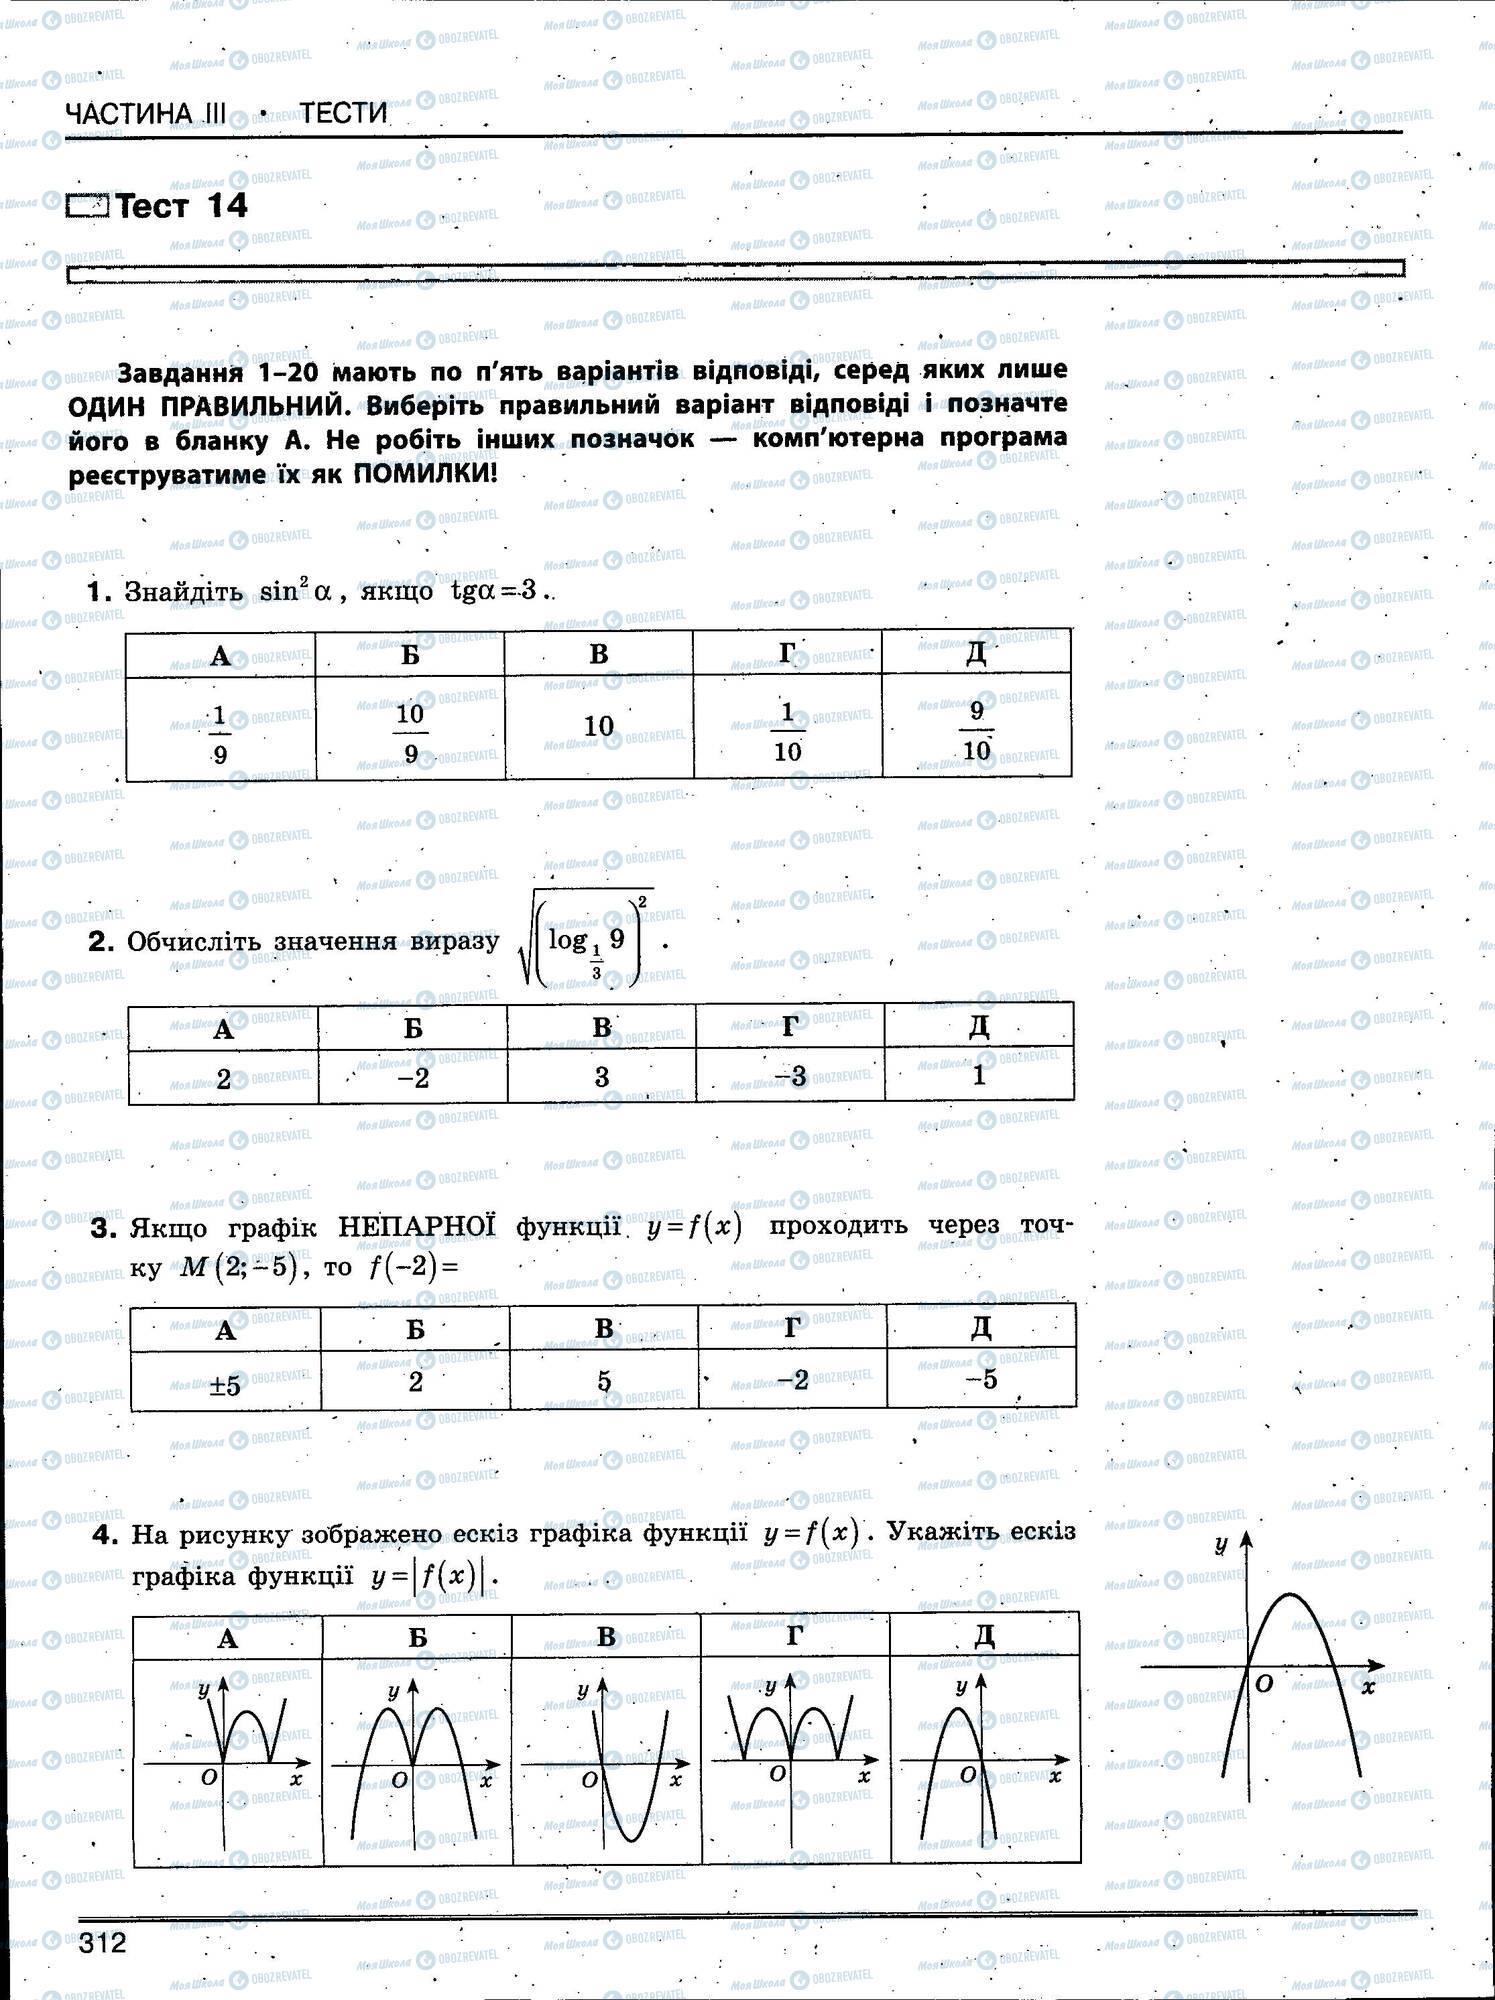 ЗНО Математика 11 класс страница 312